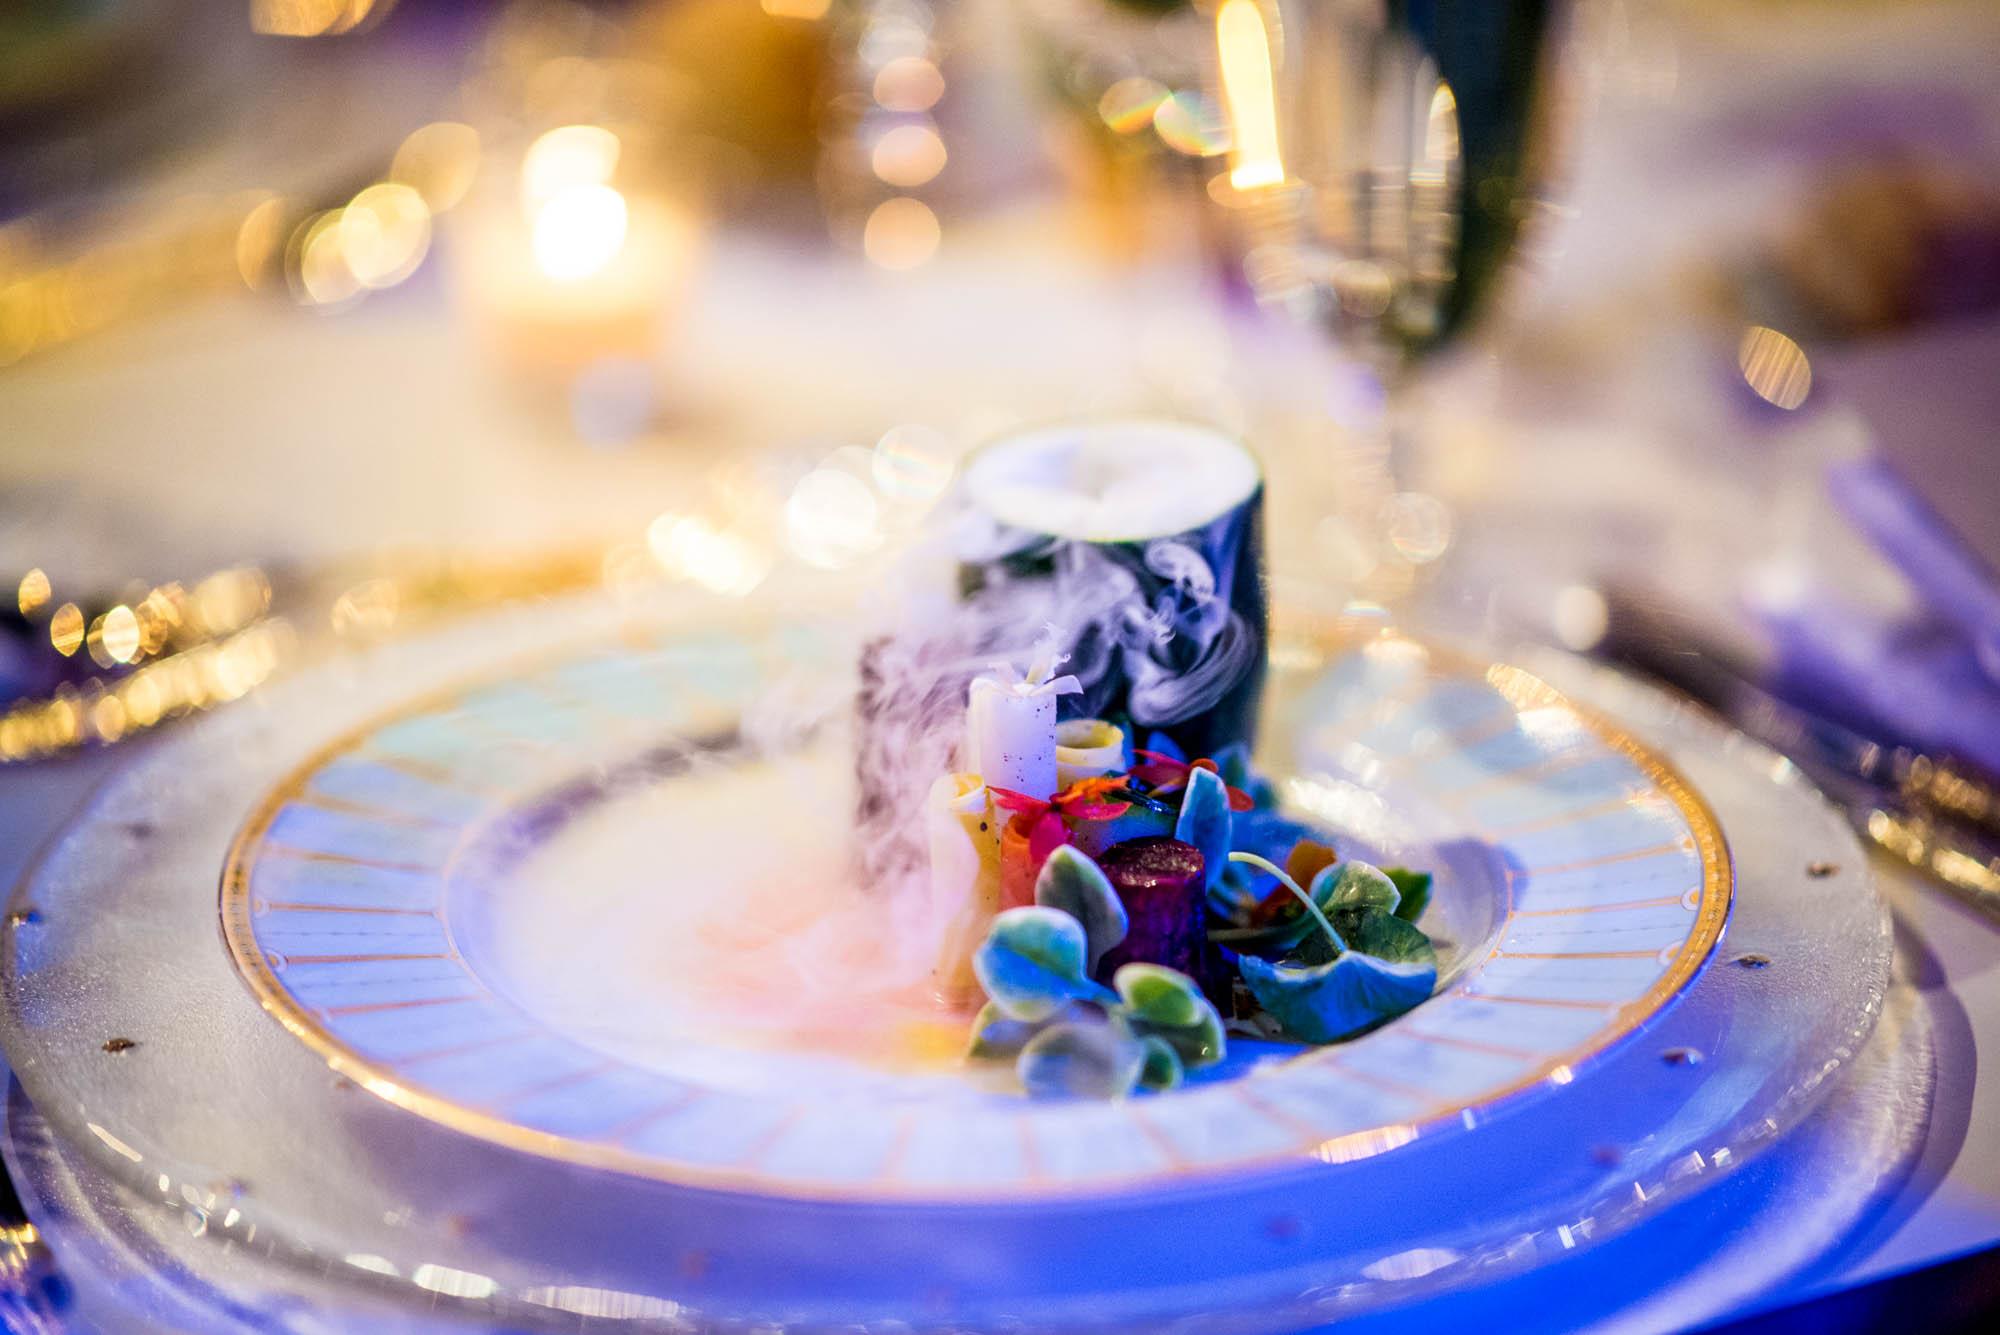 Thierry Isambert's Cloche Terranium Salad with Edible Flowers, Crystal Lettuce, Beets, Carrots, Zucchini, Lemon Vinaigrette & Violet Scented Fog